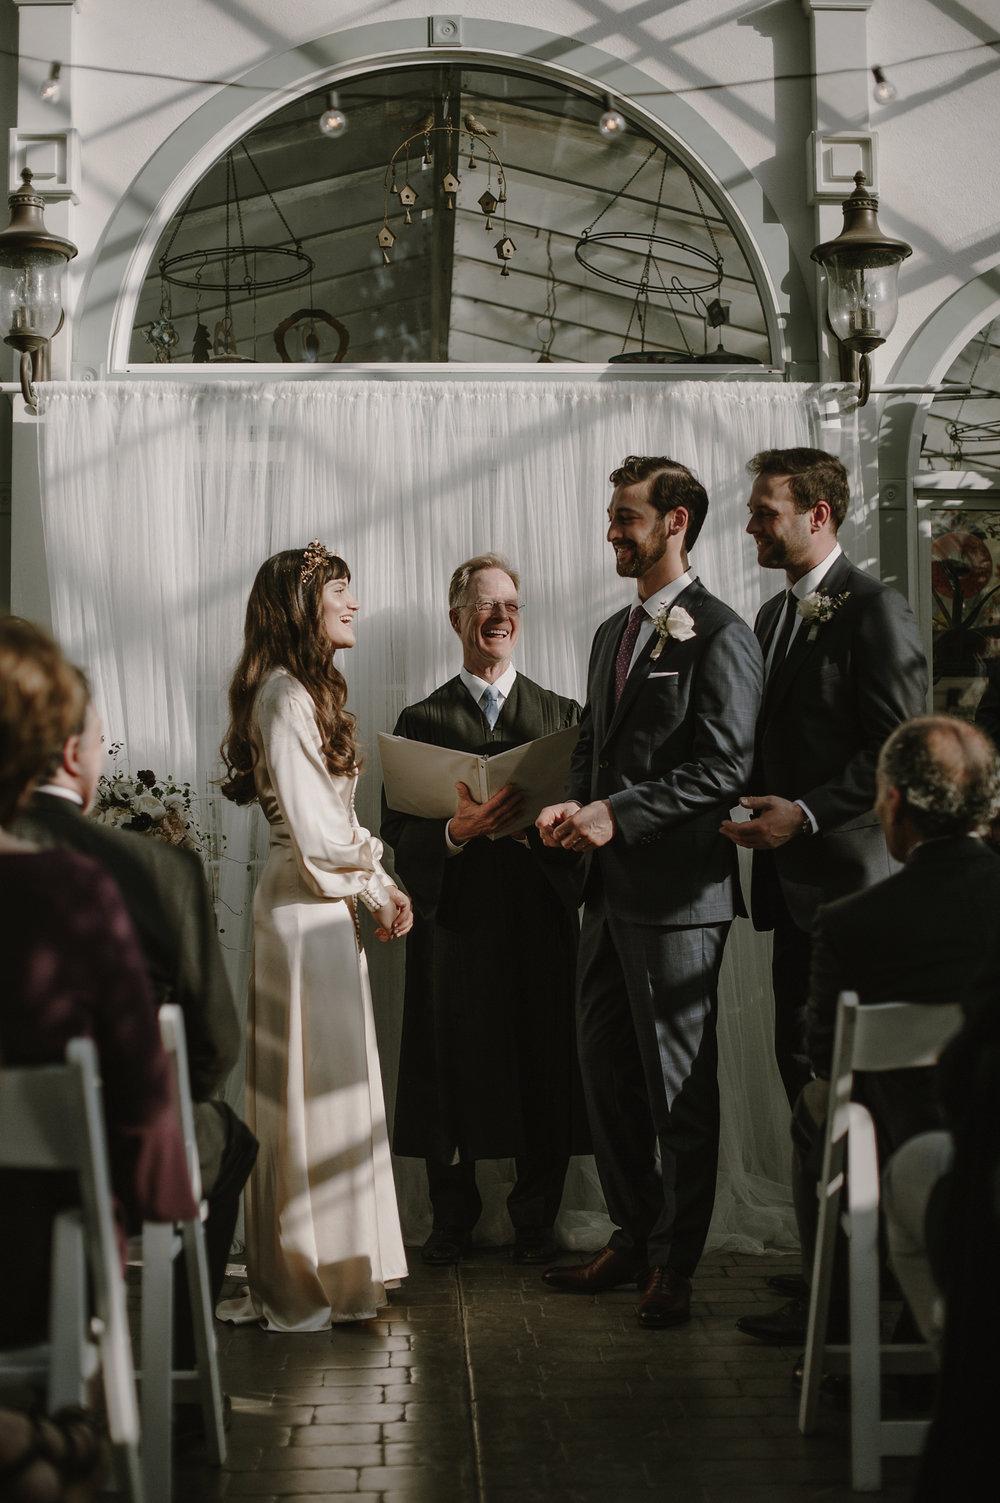 kristenmarieparker_tacoma_conservatory_warehouse_wedding044.JPG